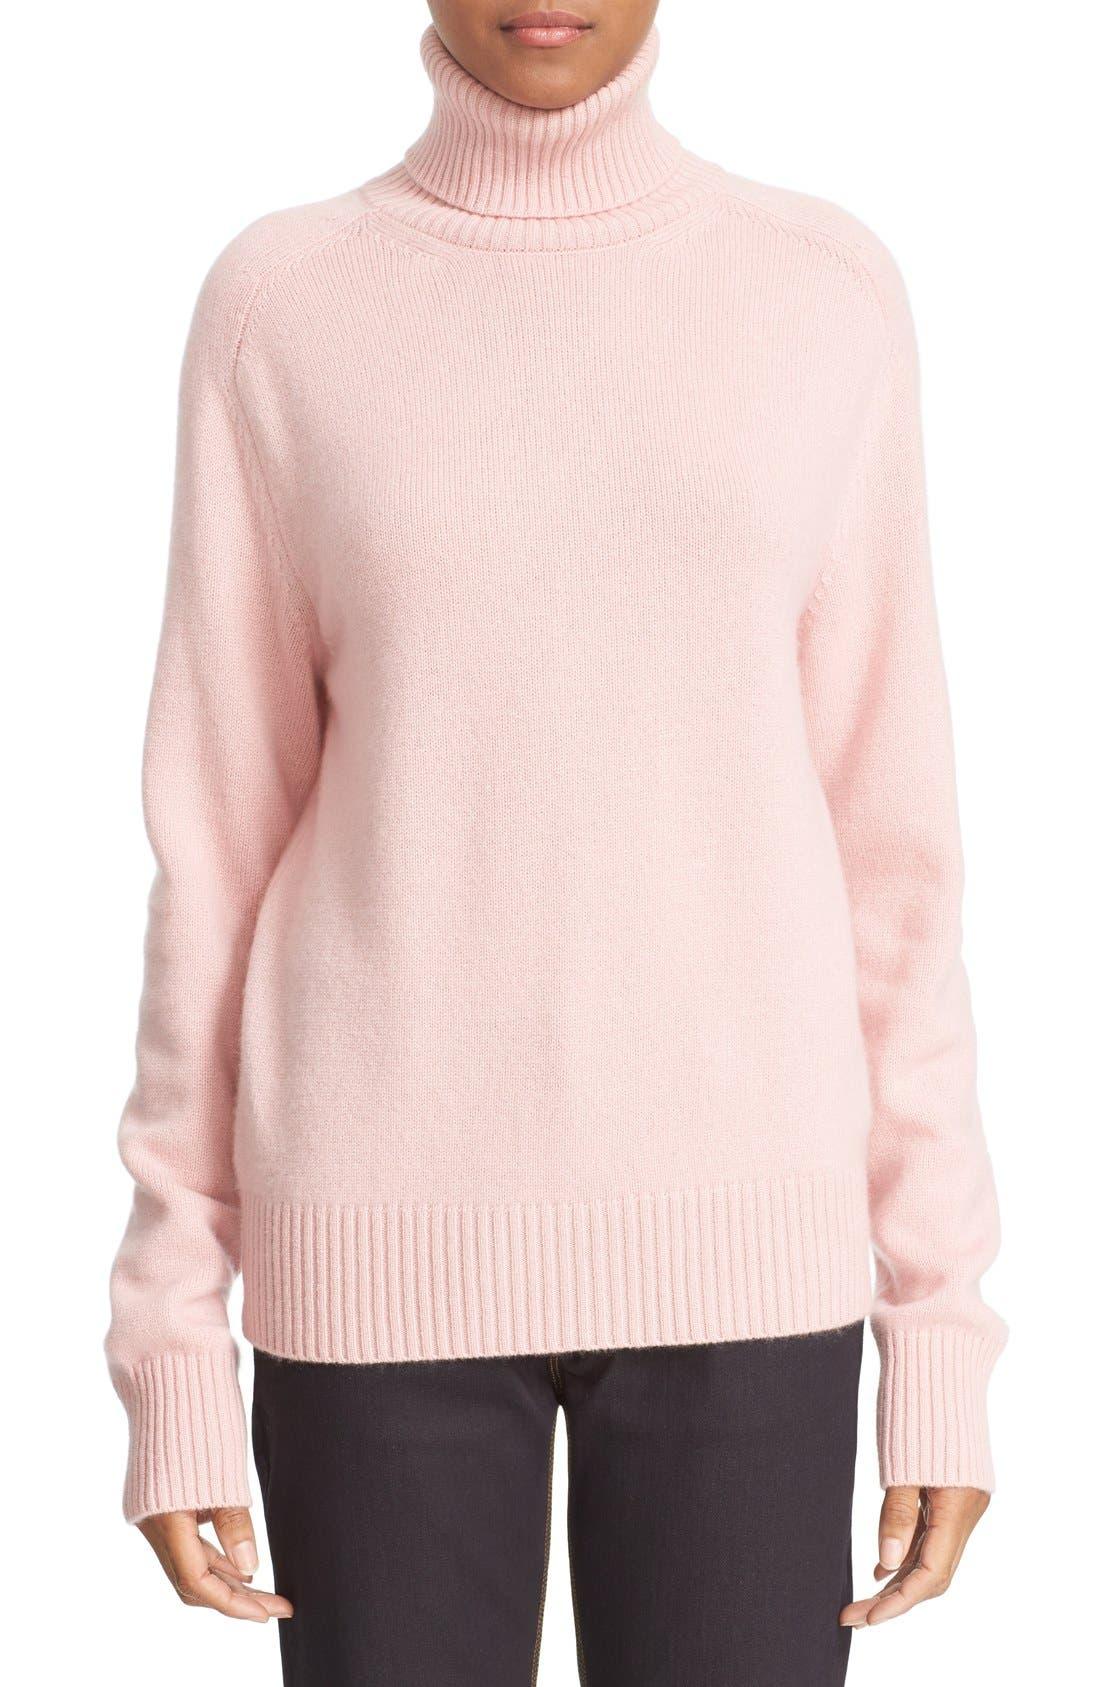 Main Image - Tomas Maier Cashmere Turtleneck Sweater